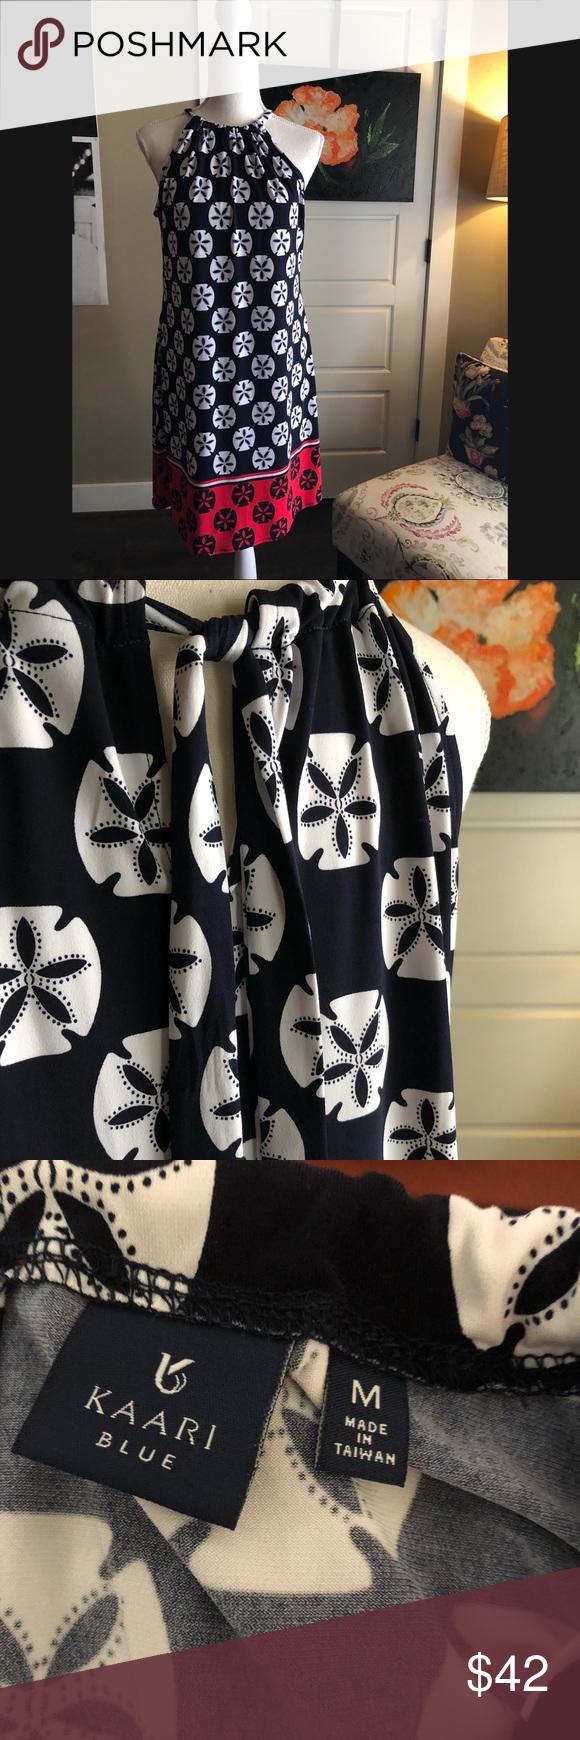 Kaari Blue Sand Dollar Dress Nwot Boasting A Fun Sand Dollar Design With A Contrast Border Print This Halter Dress Dollar Dress Clothes Design Women Shopping [ 1740 x 580 Pixel ]